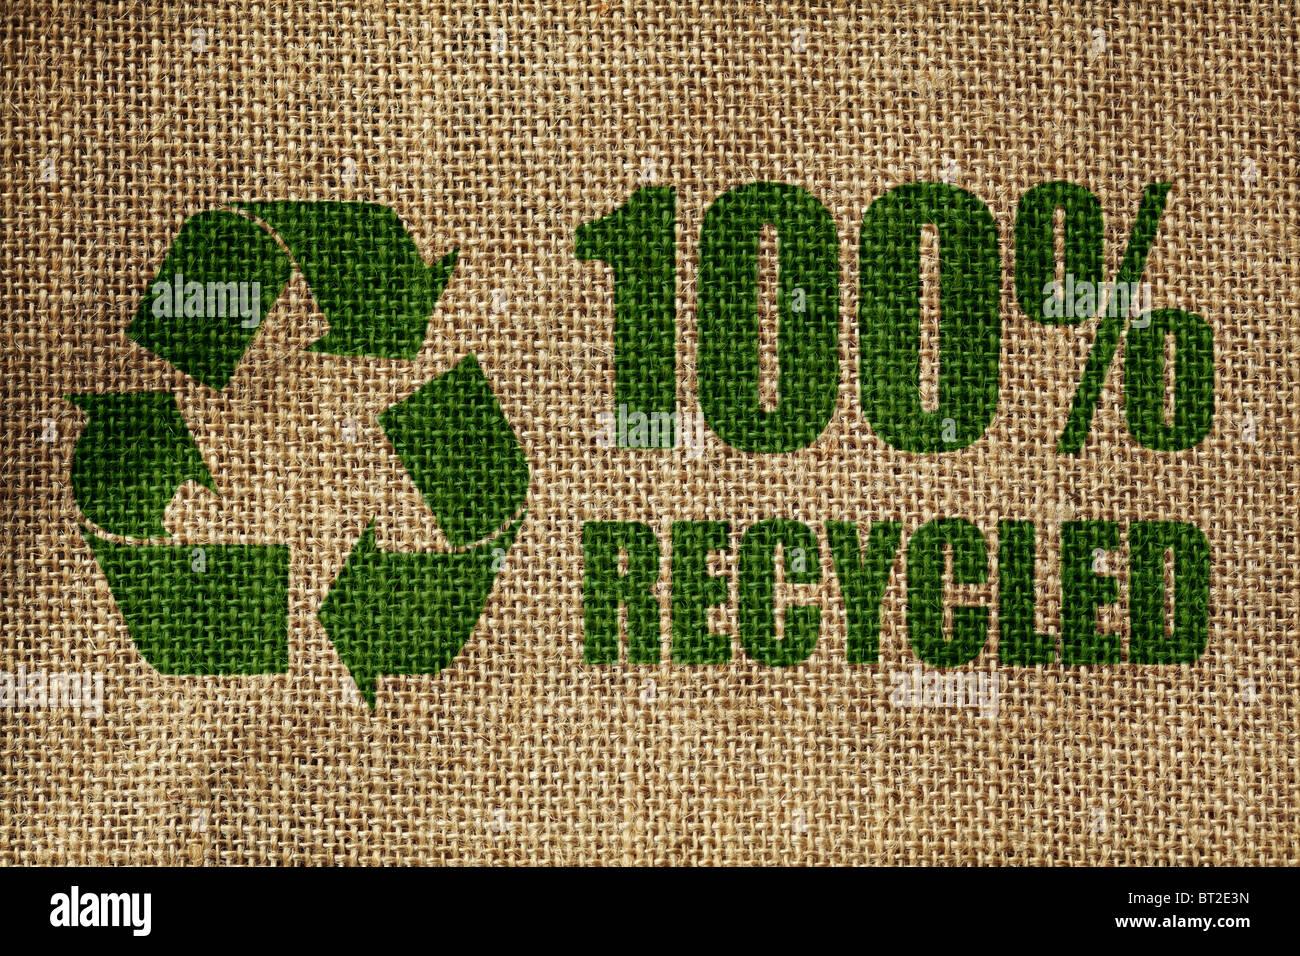 Símbolo de reciclaje Imagen De Stock